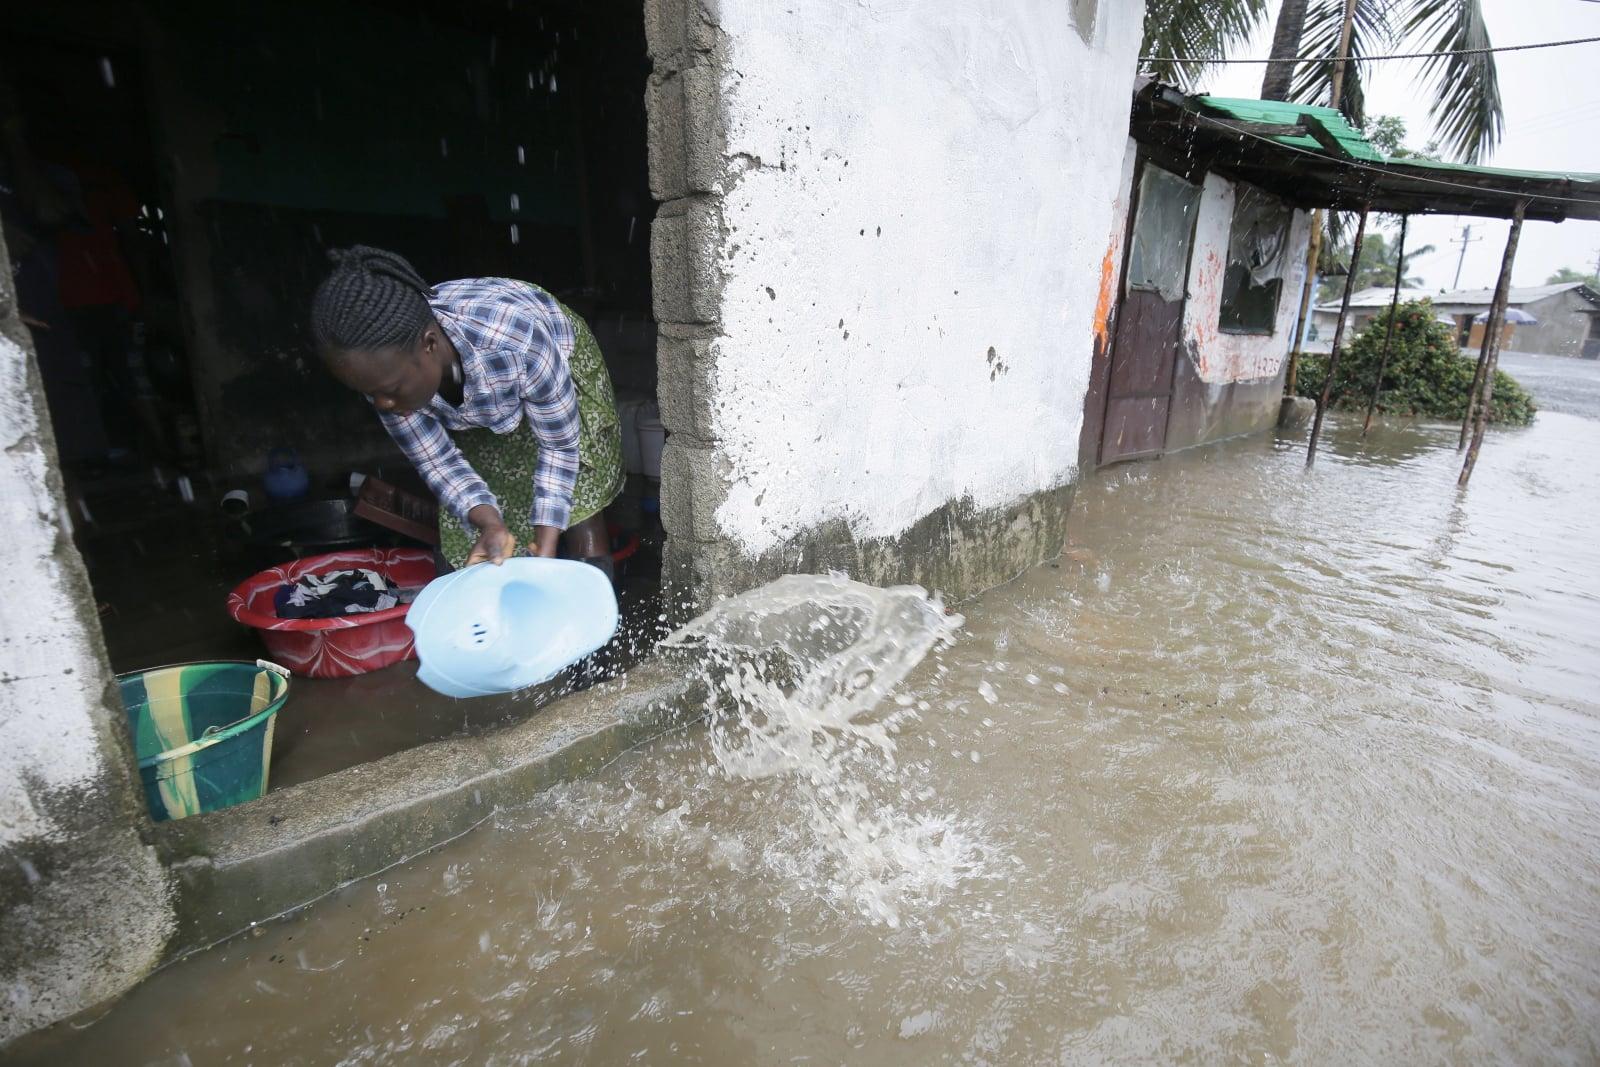 Powodzie w Liberii fot. EPA/PRAKASH ELAMAKKARA